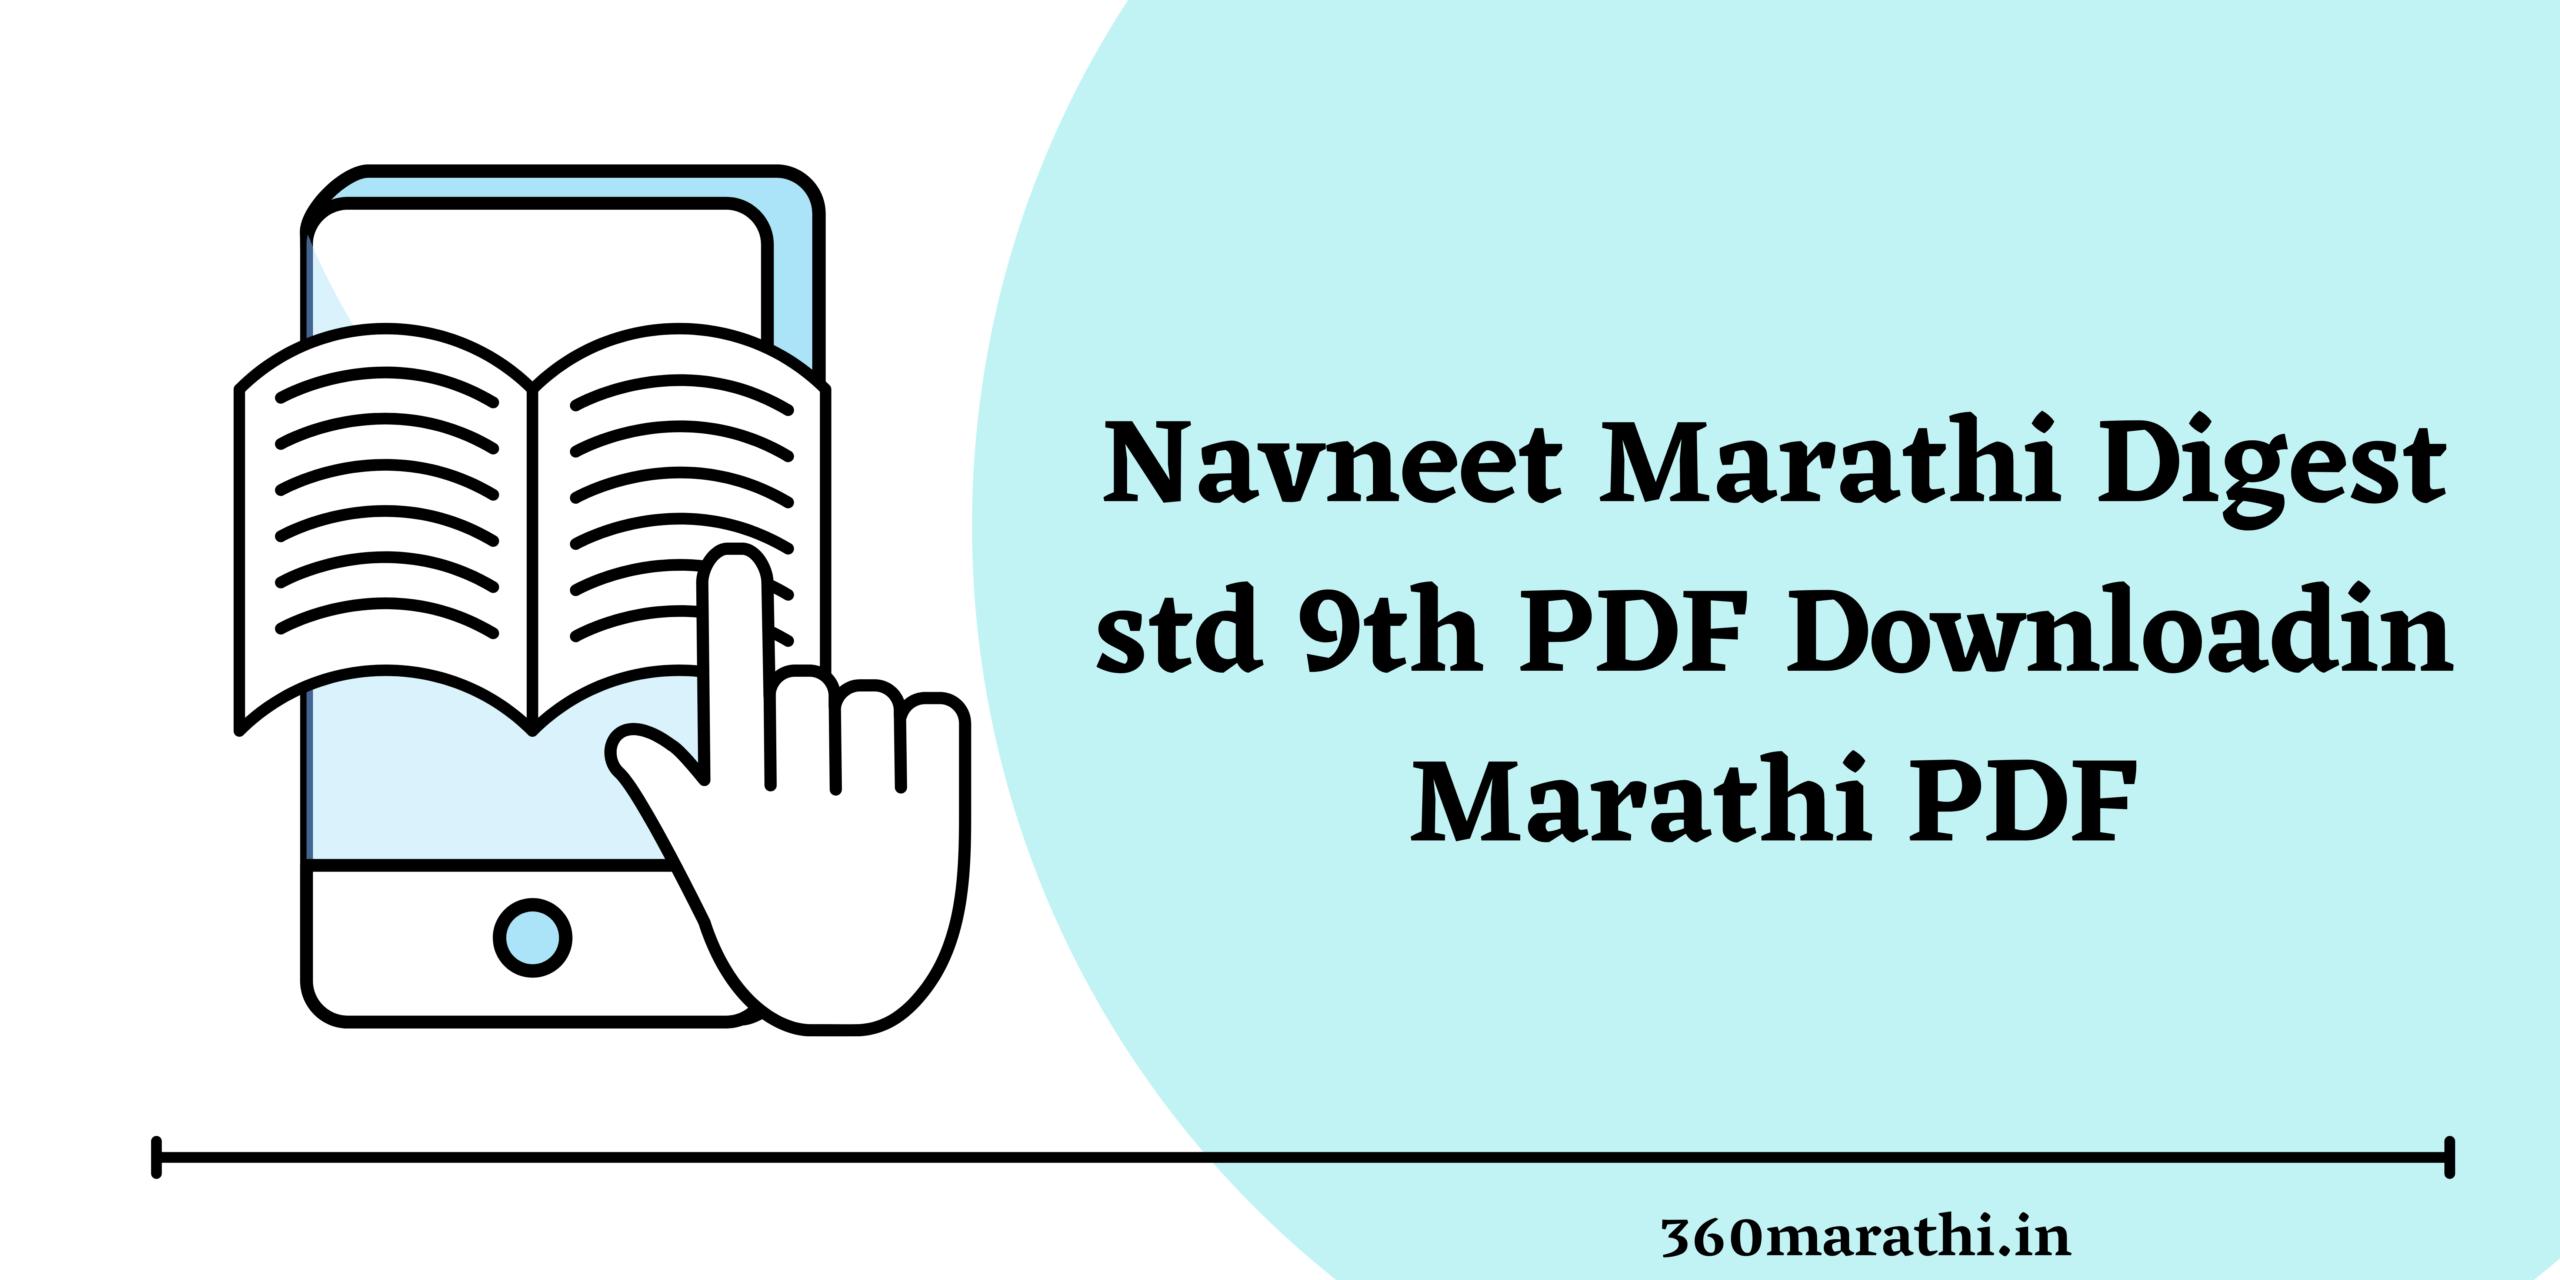 【FREE】Navneet Marathi Digest std 9th PDF Download